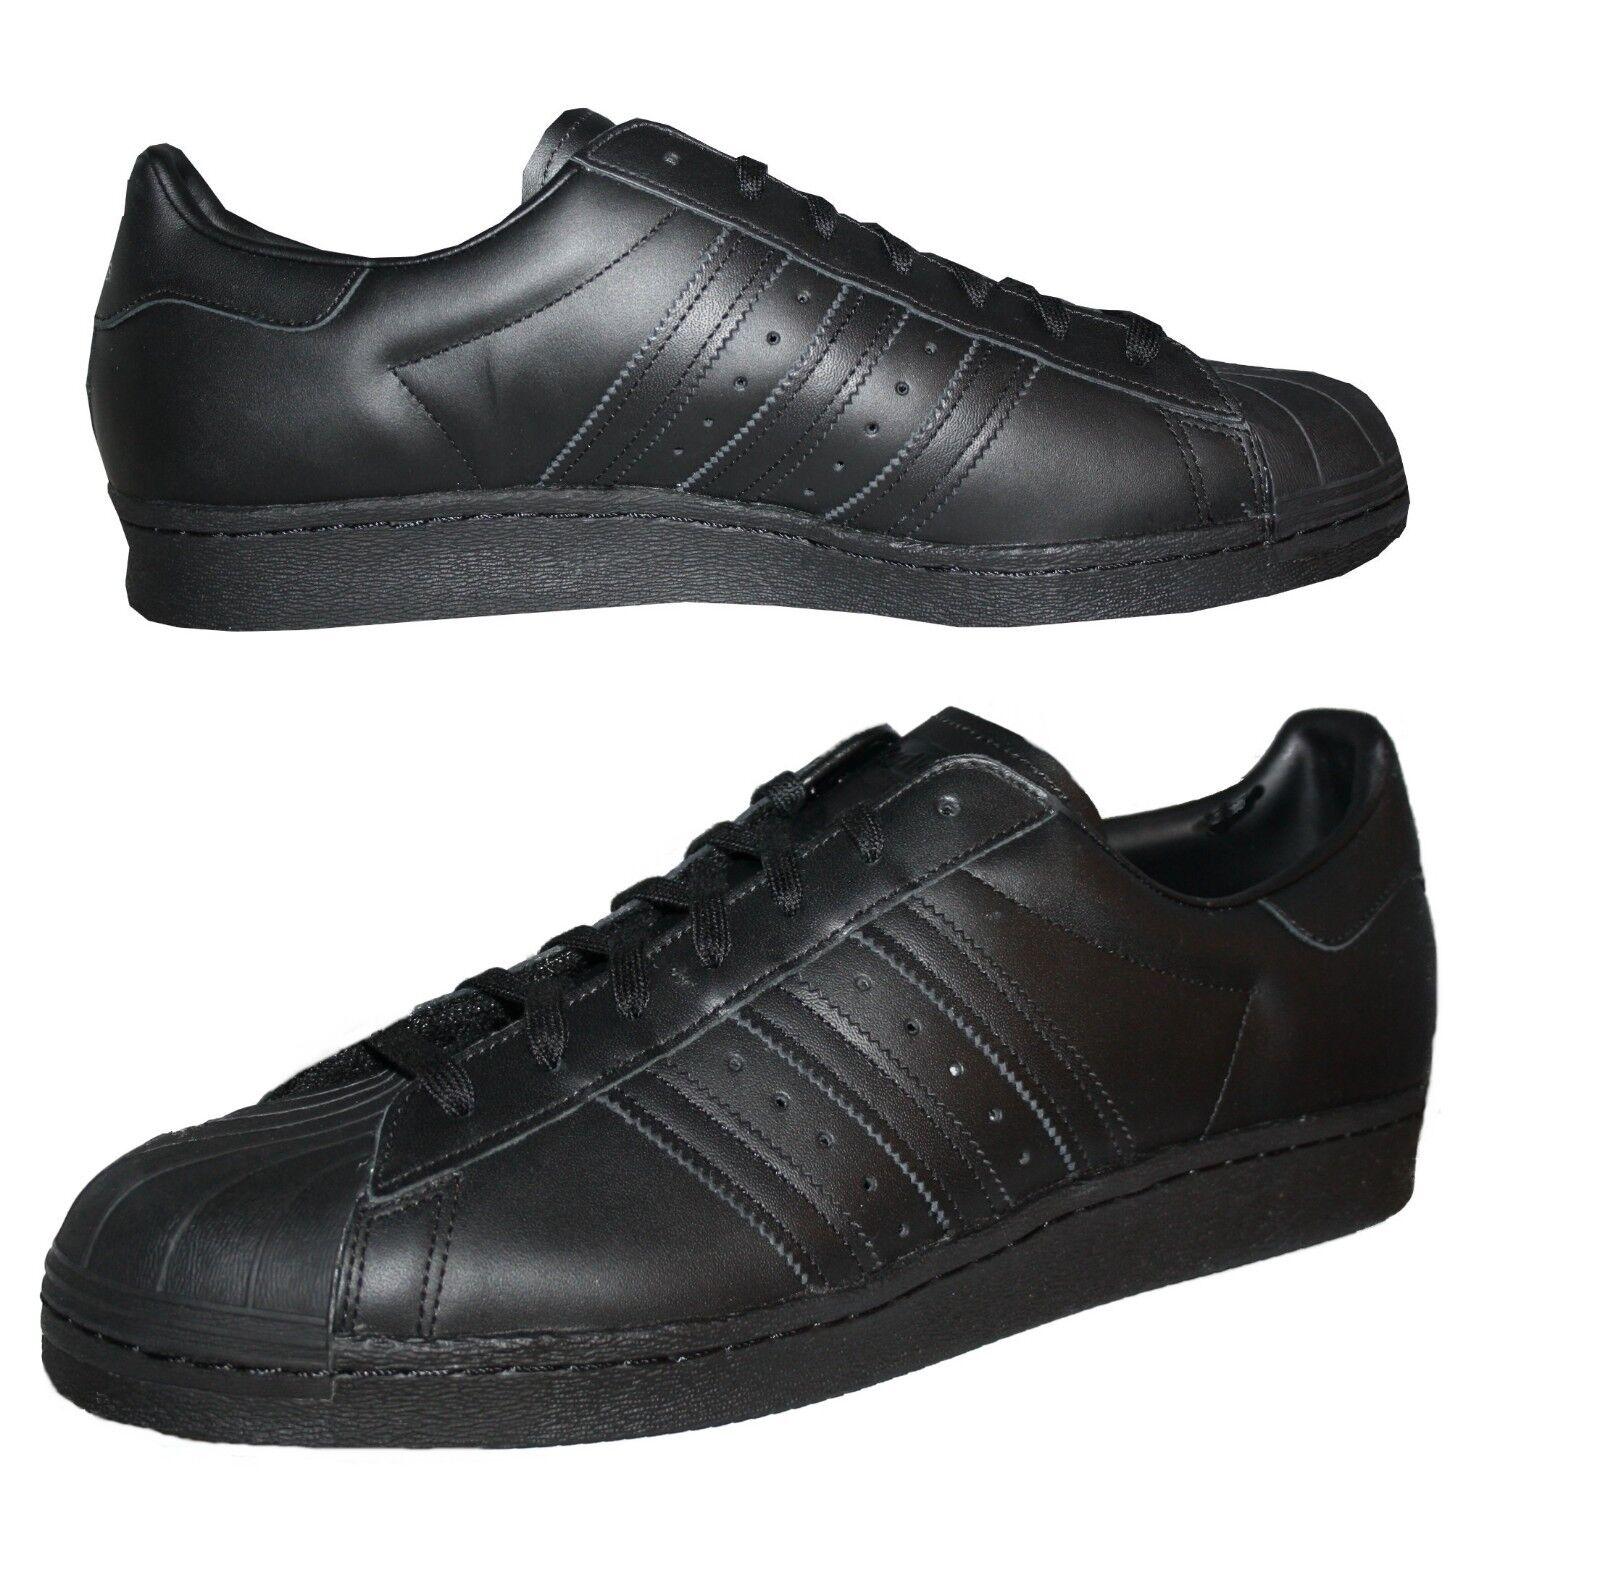 Adidas Superstar 80s Herren Retro Sneaker Schuhe Leder schwarz Gr. 49 - (49 1/3)